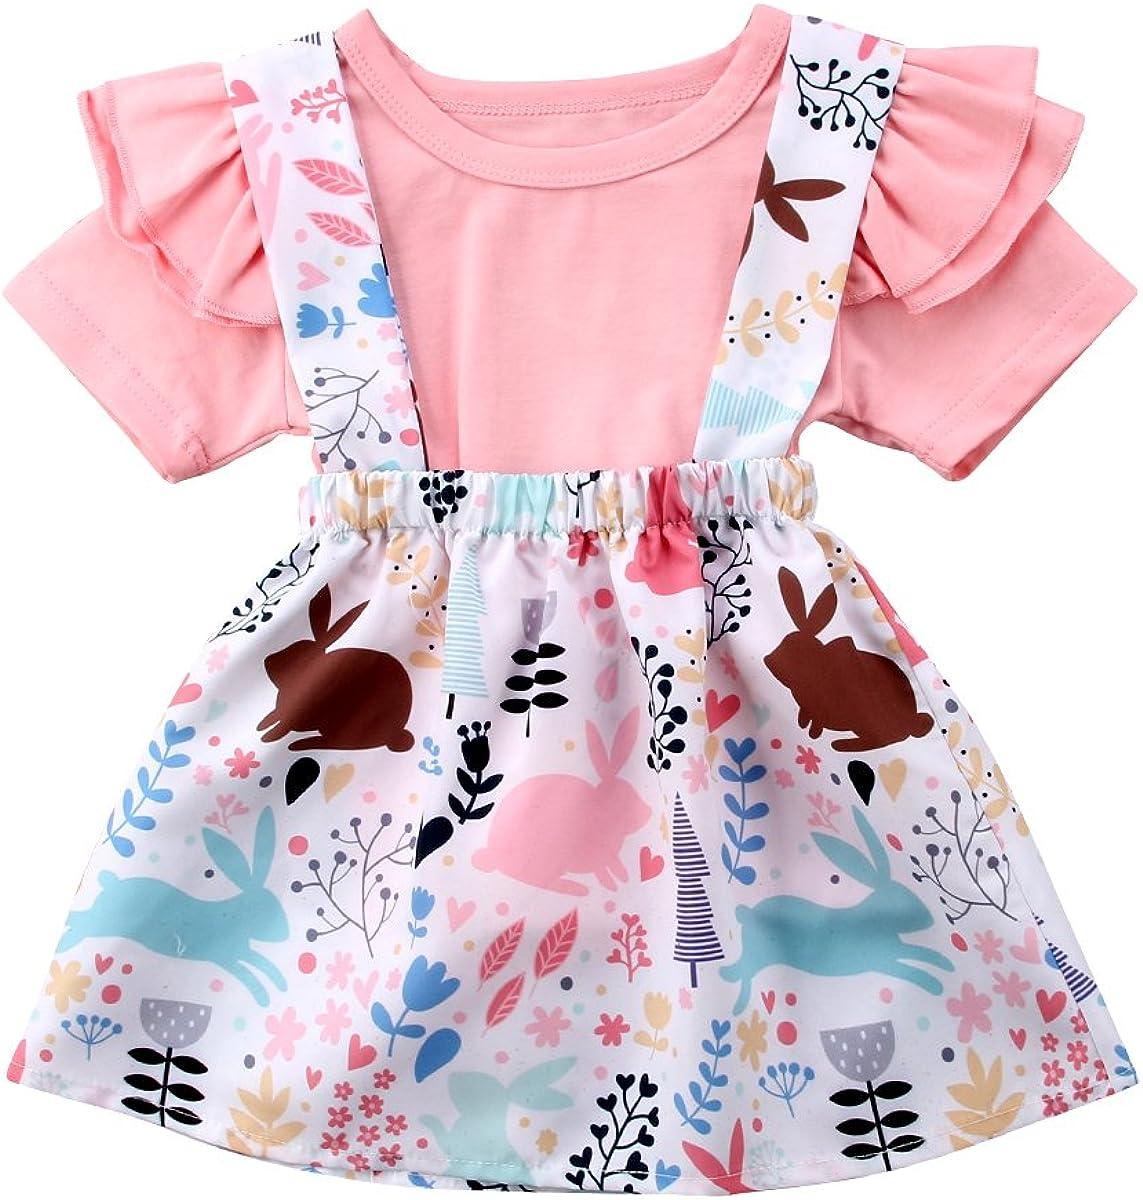 Easter Kids Baby Girl Floral Top T-shirt Dress Legging Pant Outfit Set UK Stock